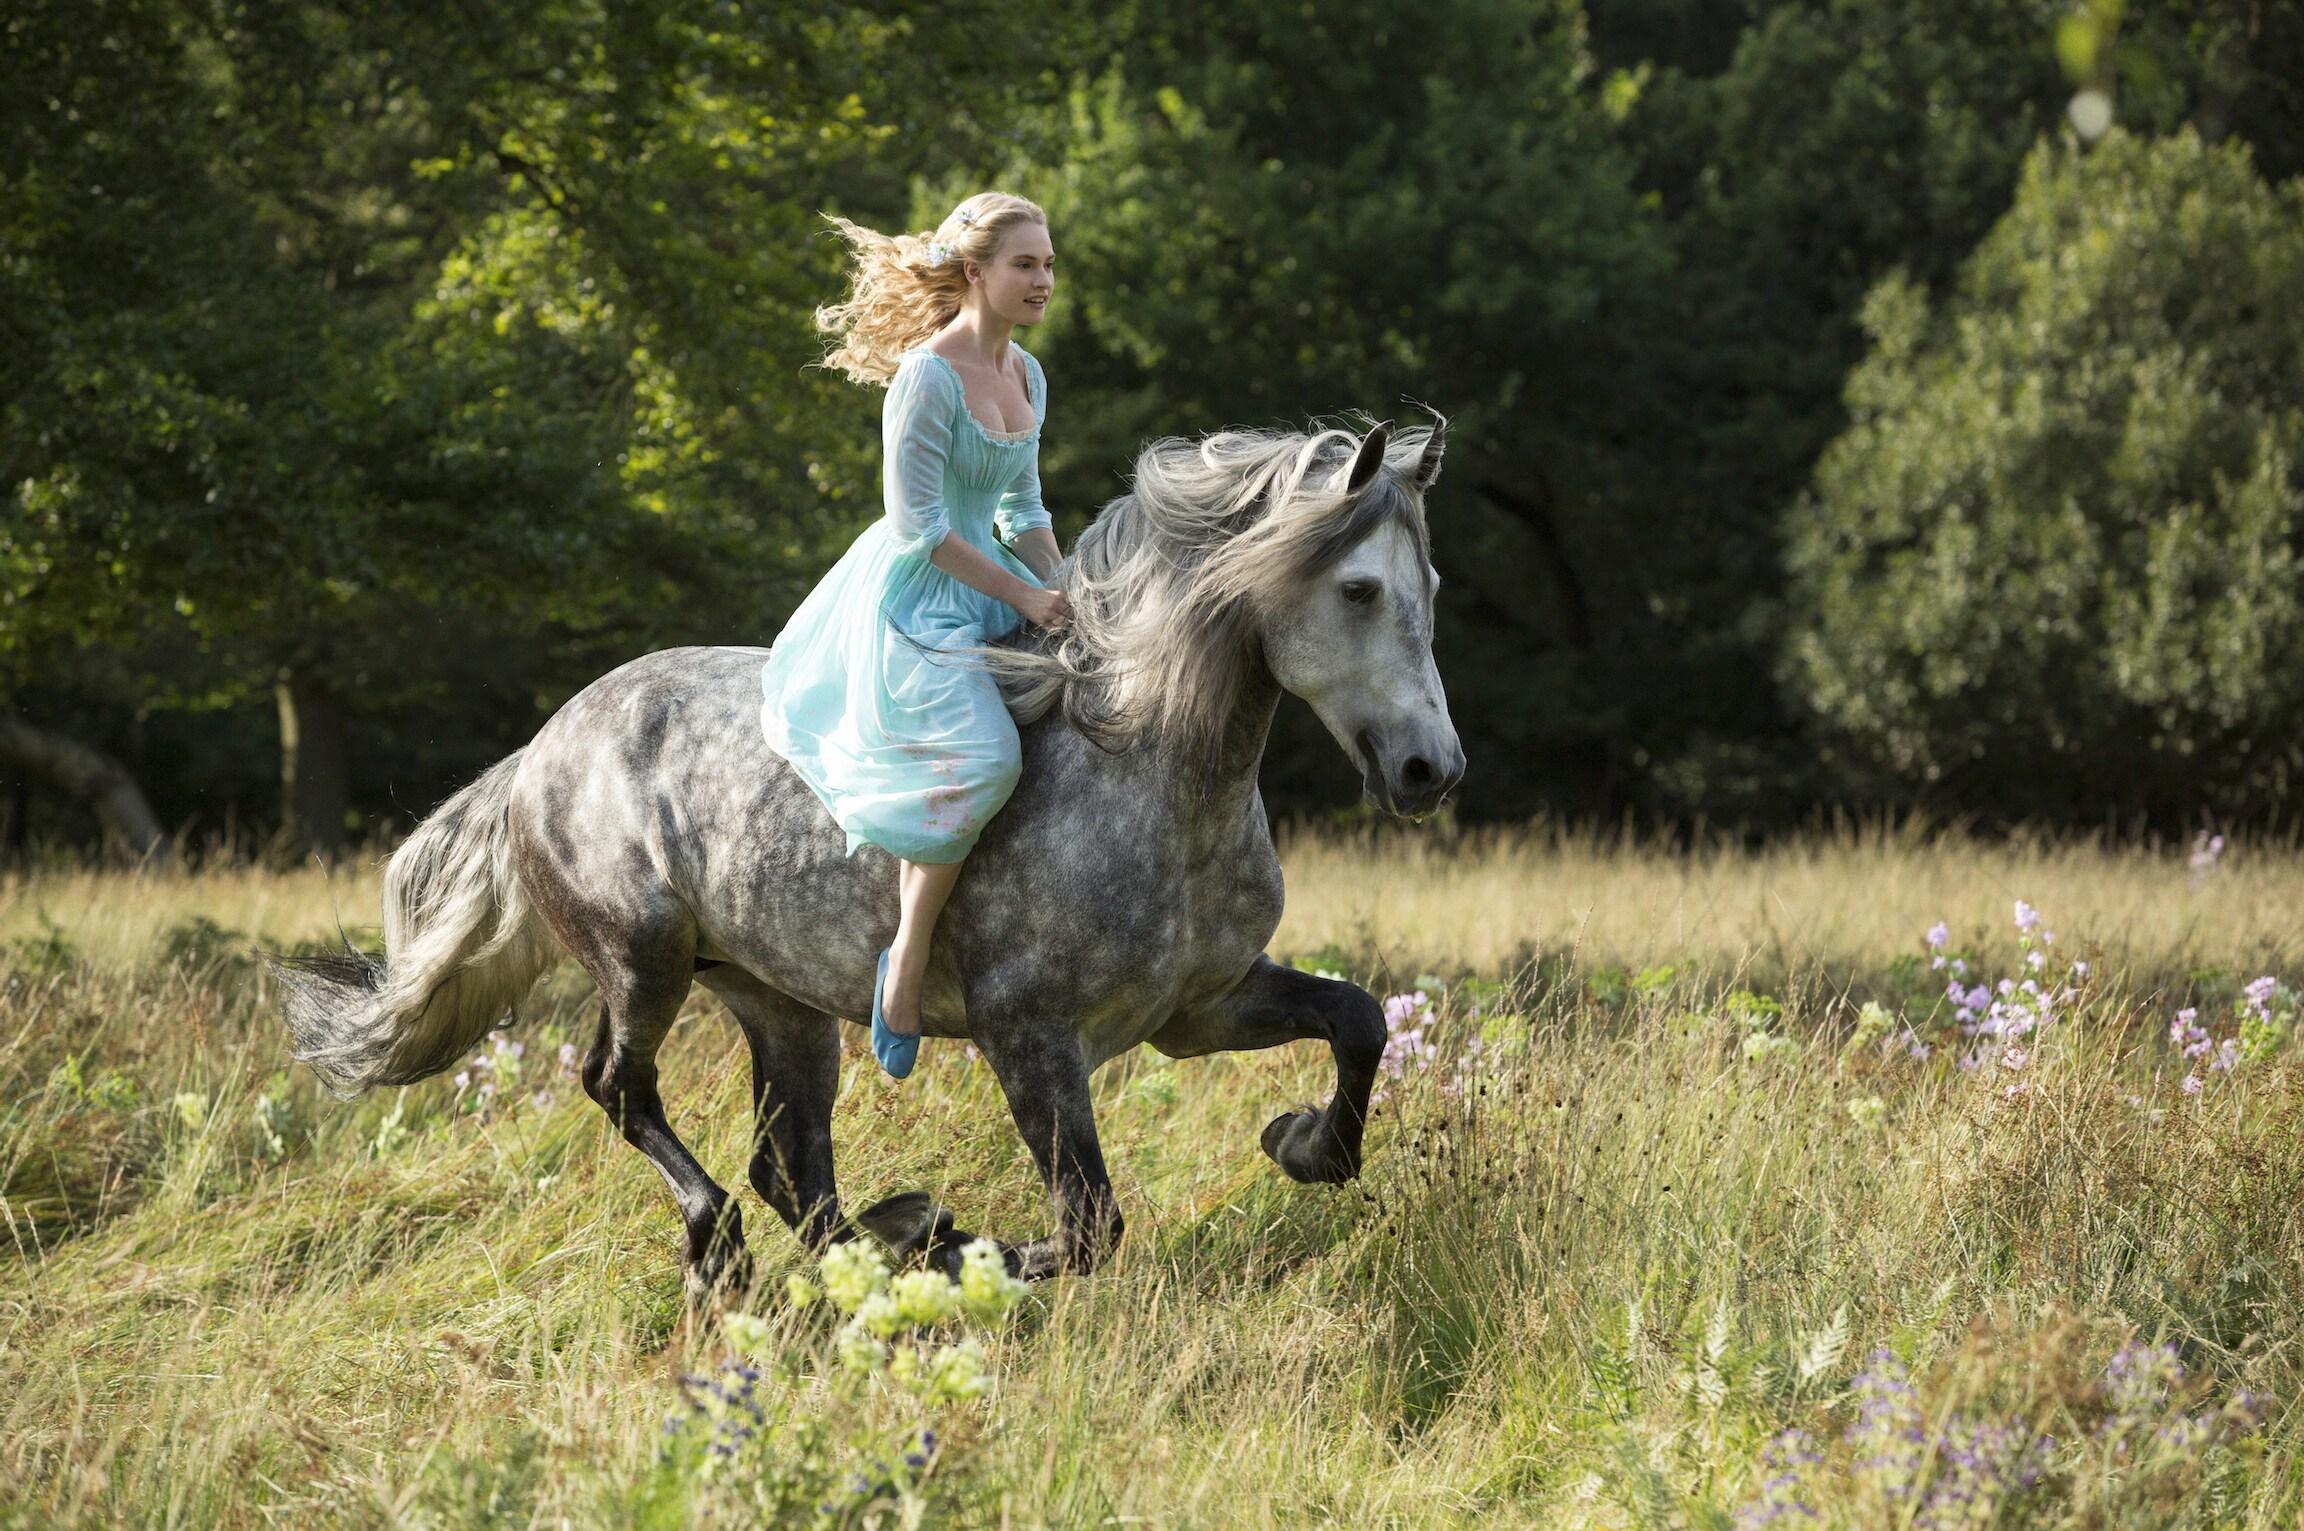 Actor Lily James (as Cinderella) on horseback in the movie Cinderella.